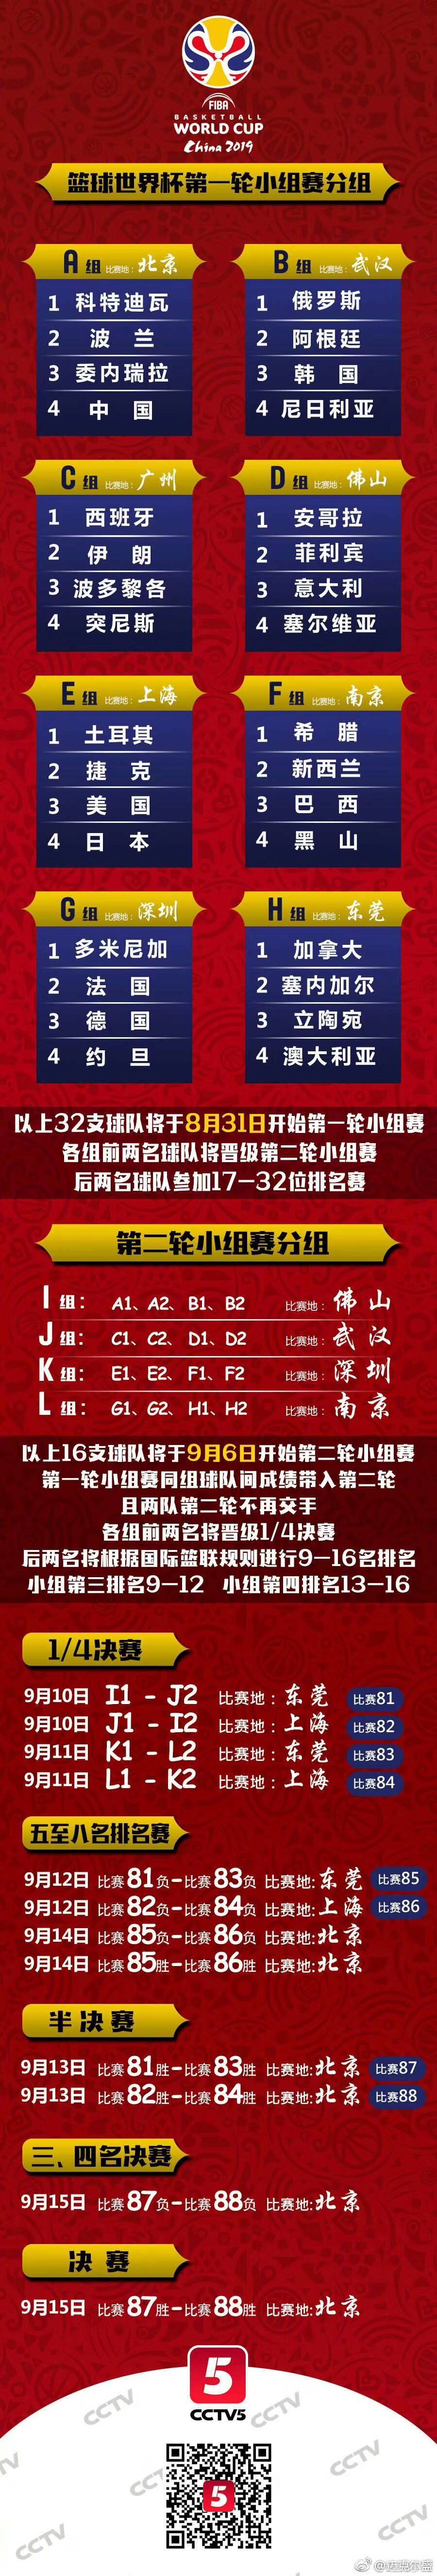 fiba 篮球世界杯中国男篮赛程时间